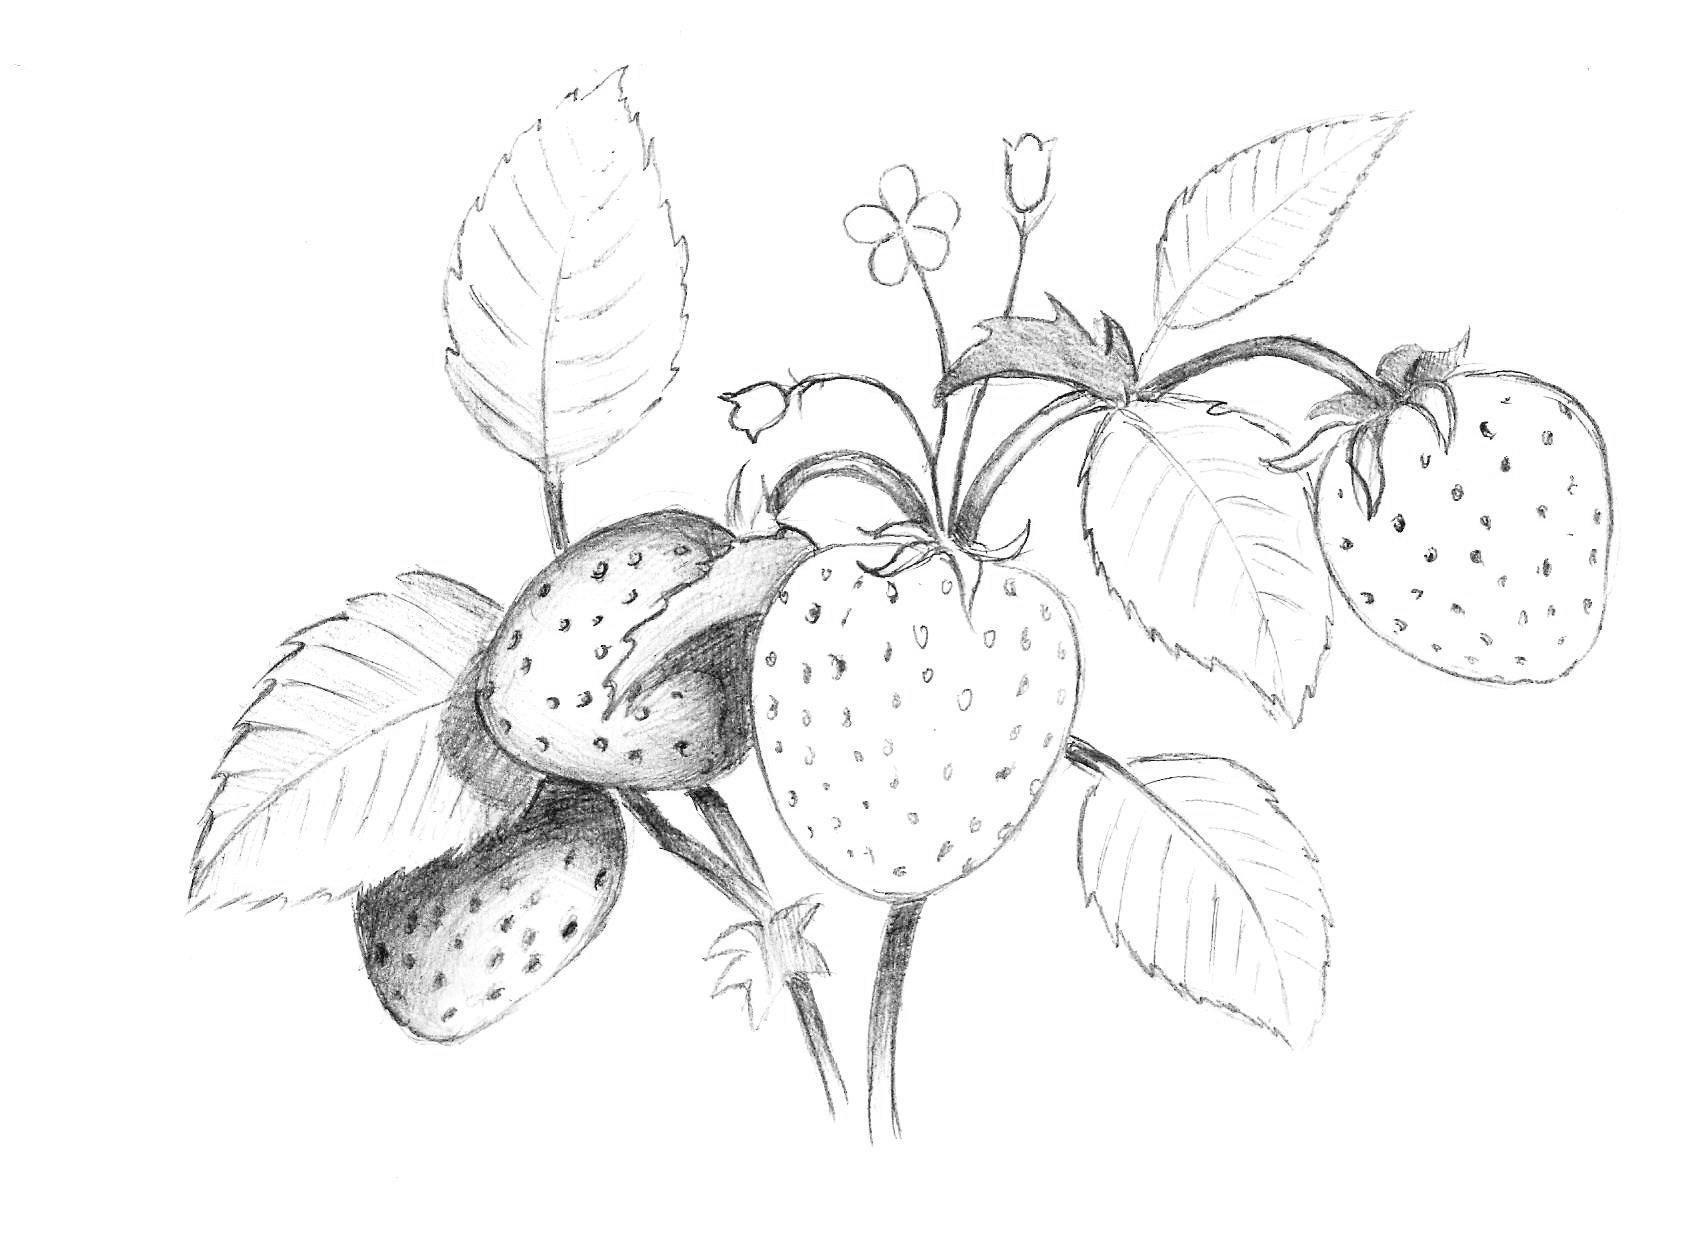 красавица рисуем карандашом ягоды картинки качестве